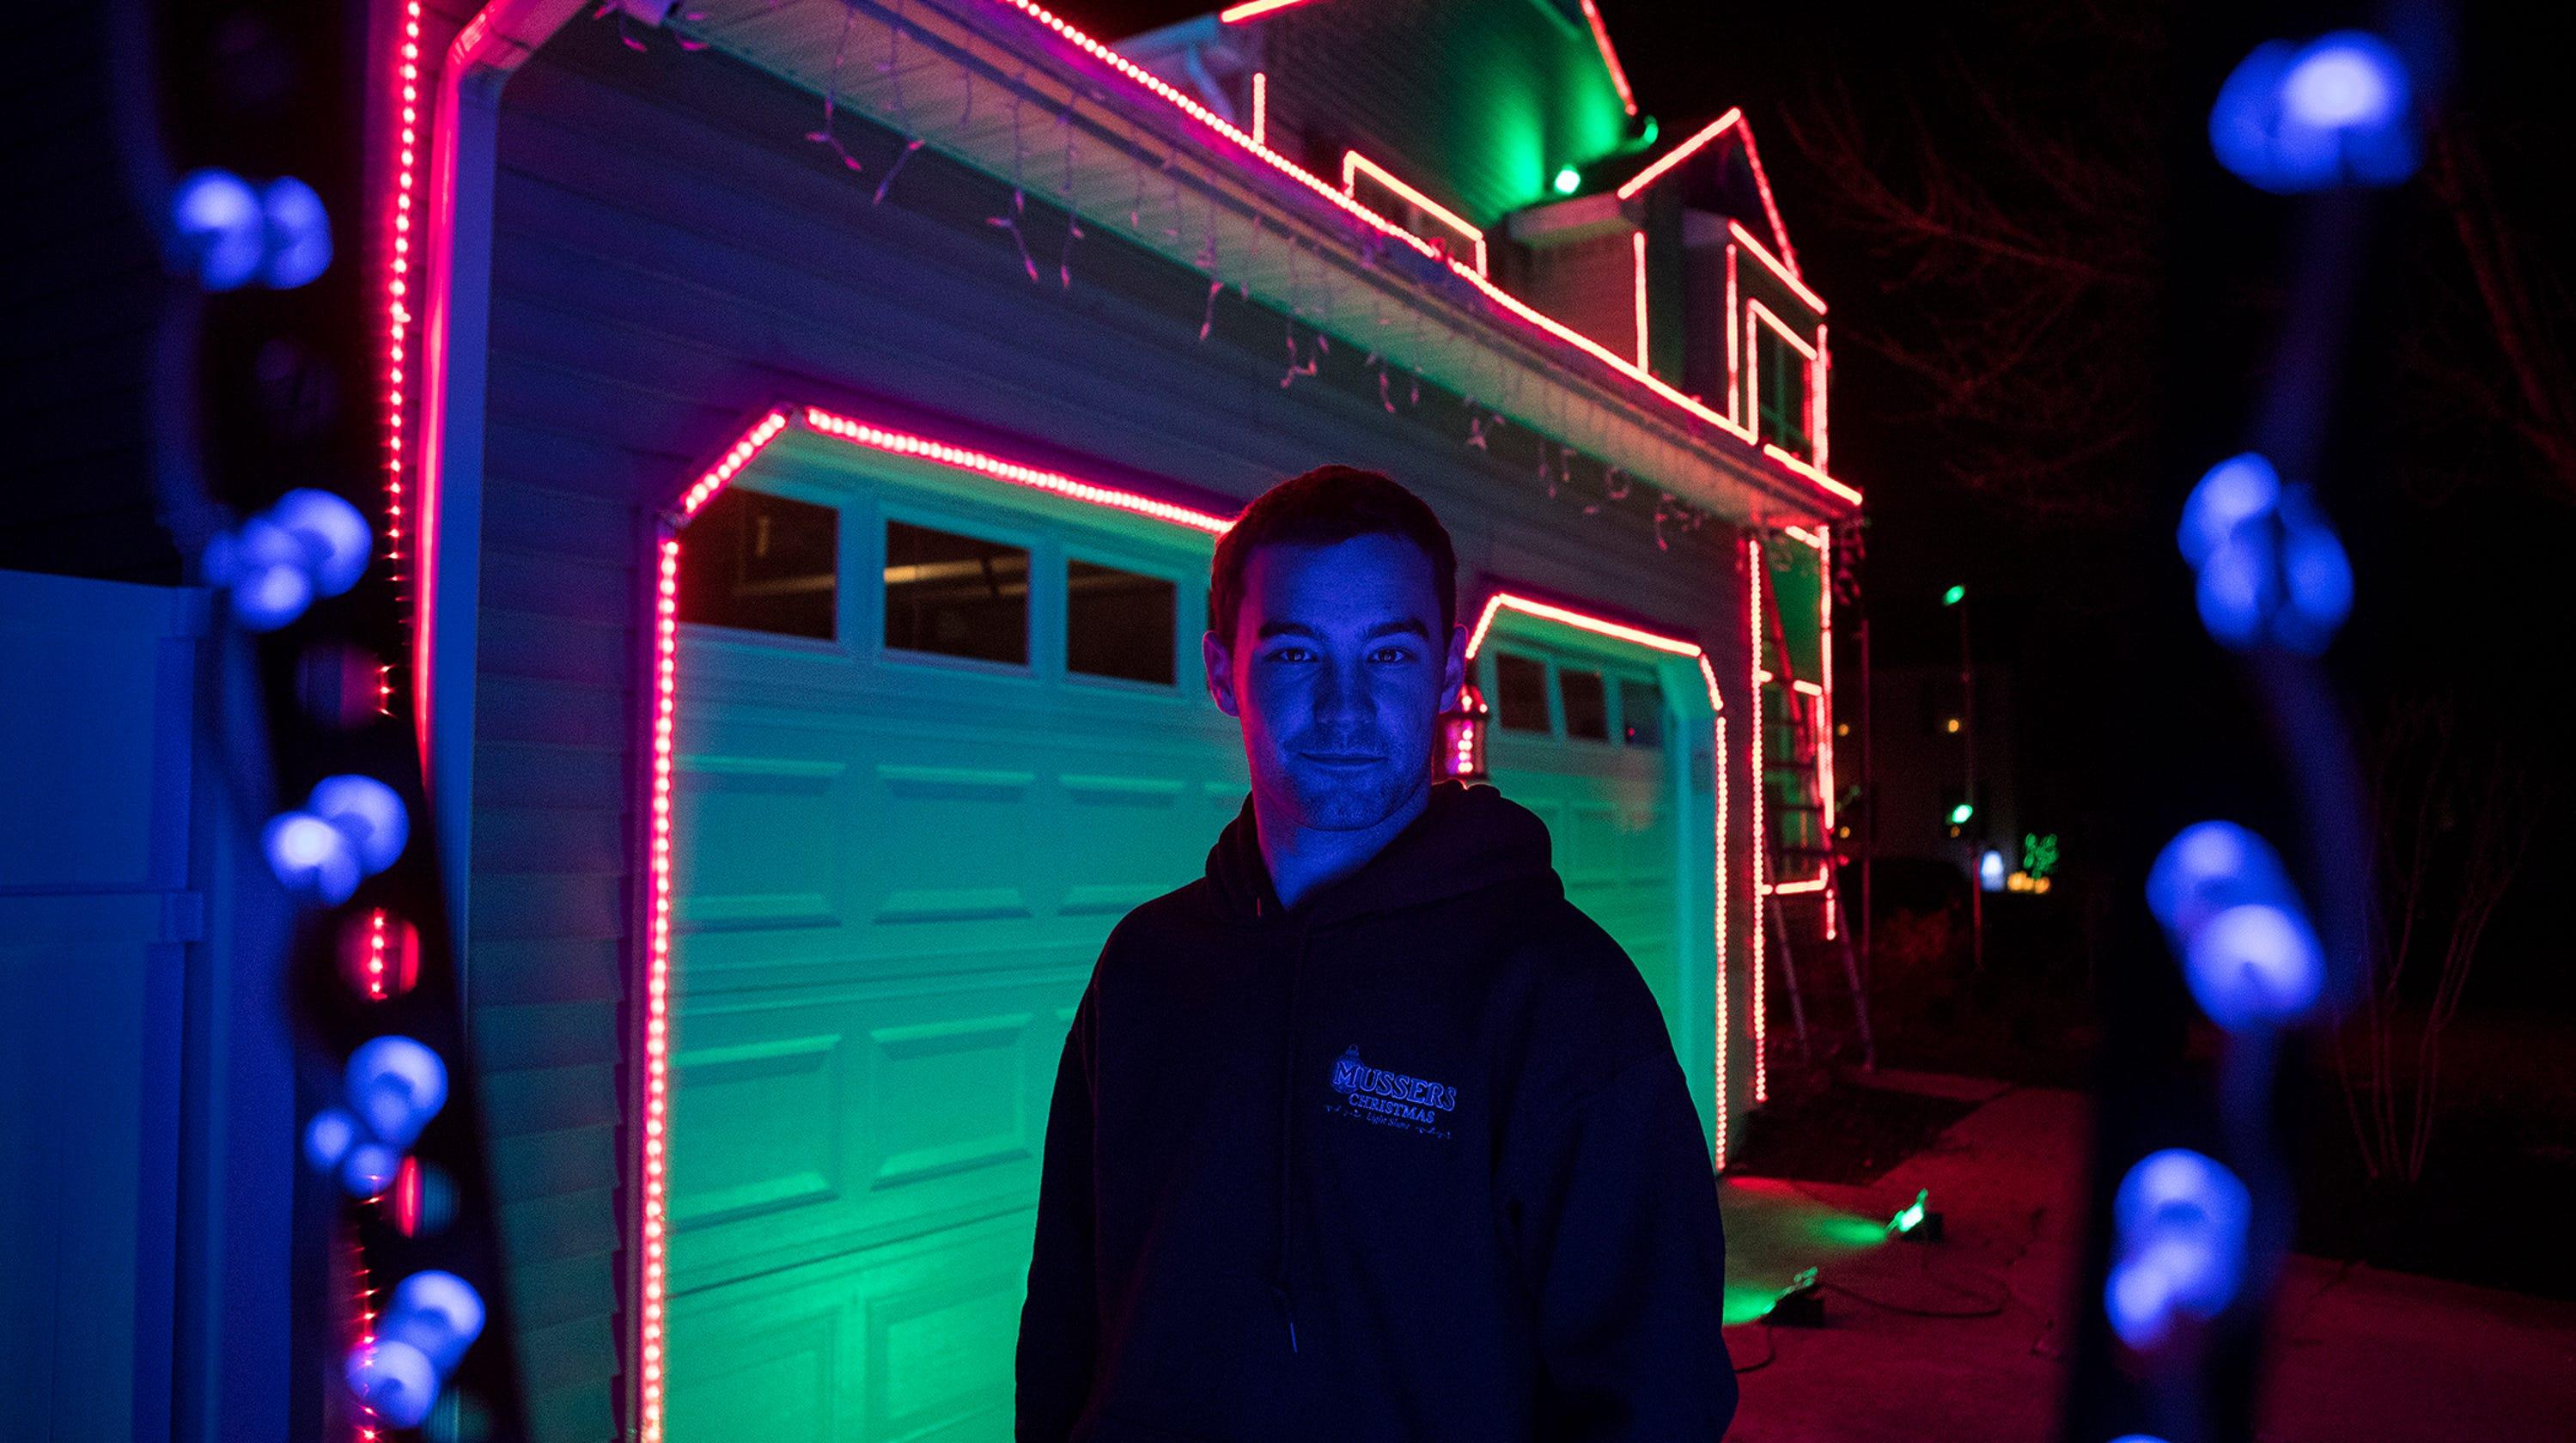 Christmas Light Show Near Me.Delaware Christmas Light Show Bigger Than Ever With 6 000